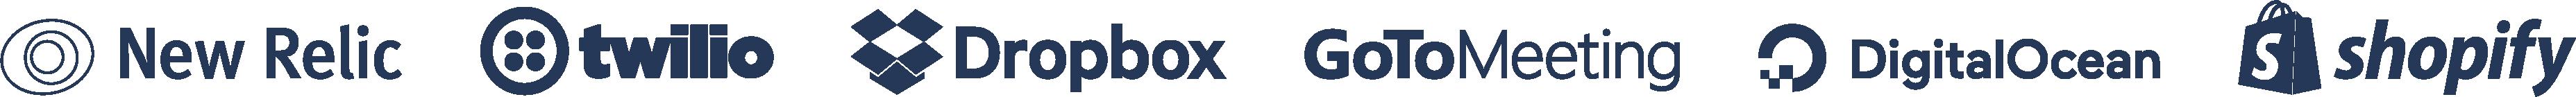 New Relic, Twilio, Dropbox, GoToMeeting, DigitalOcean, Shopify